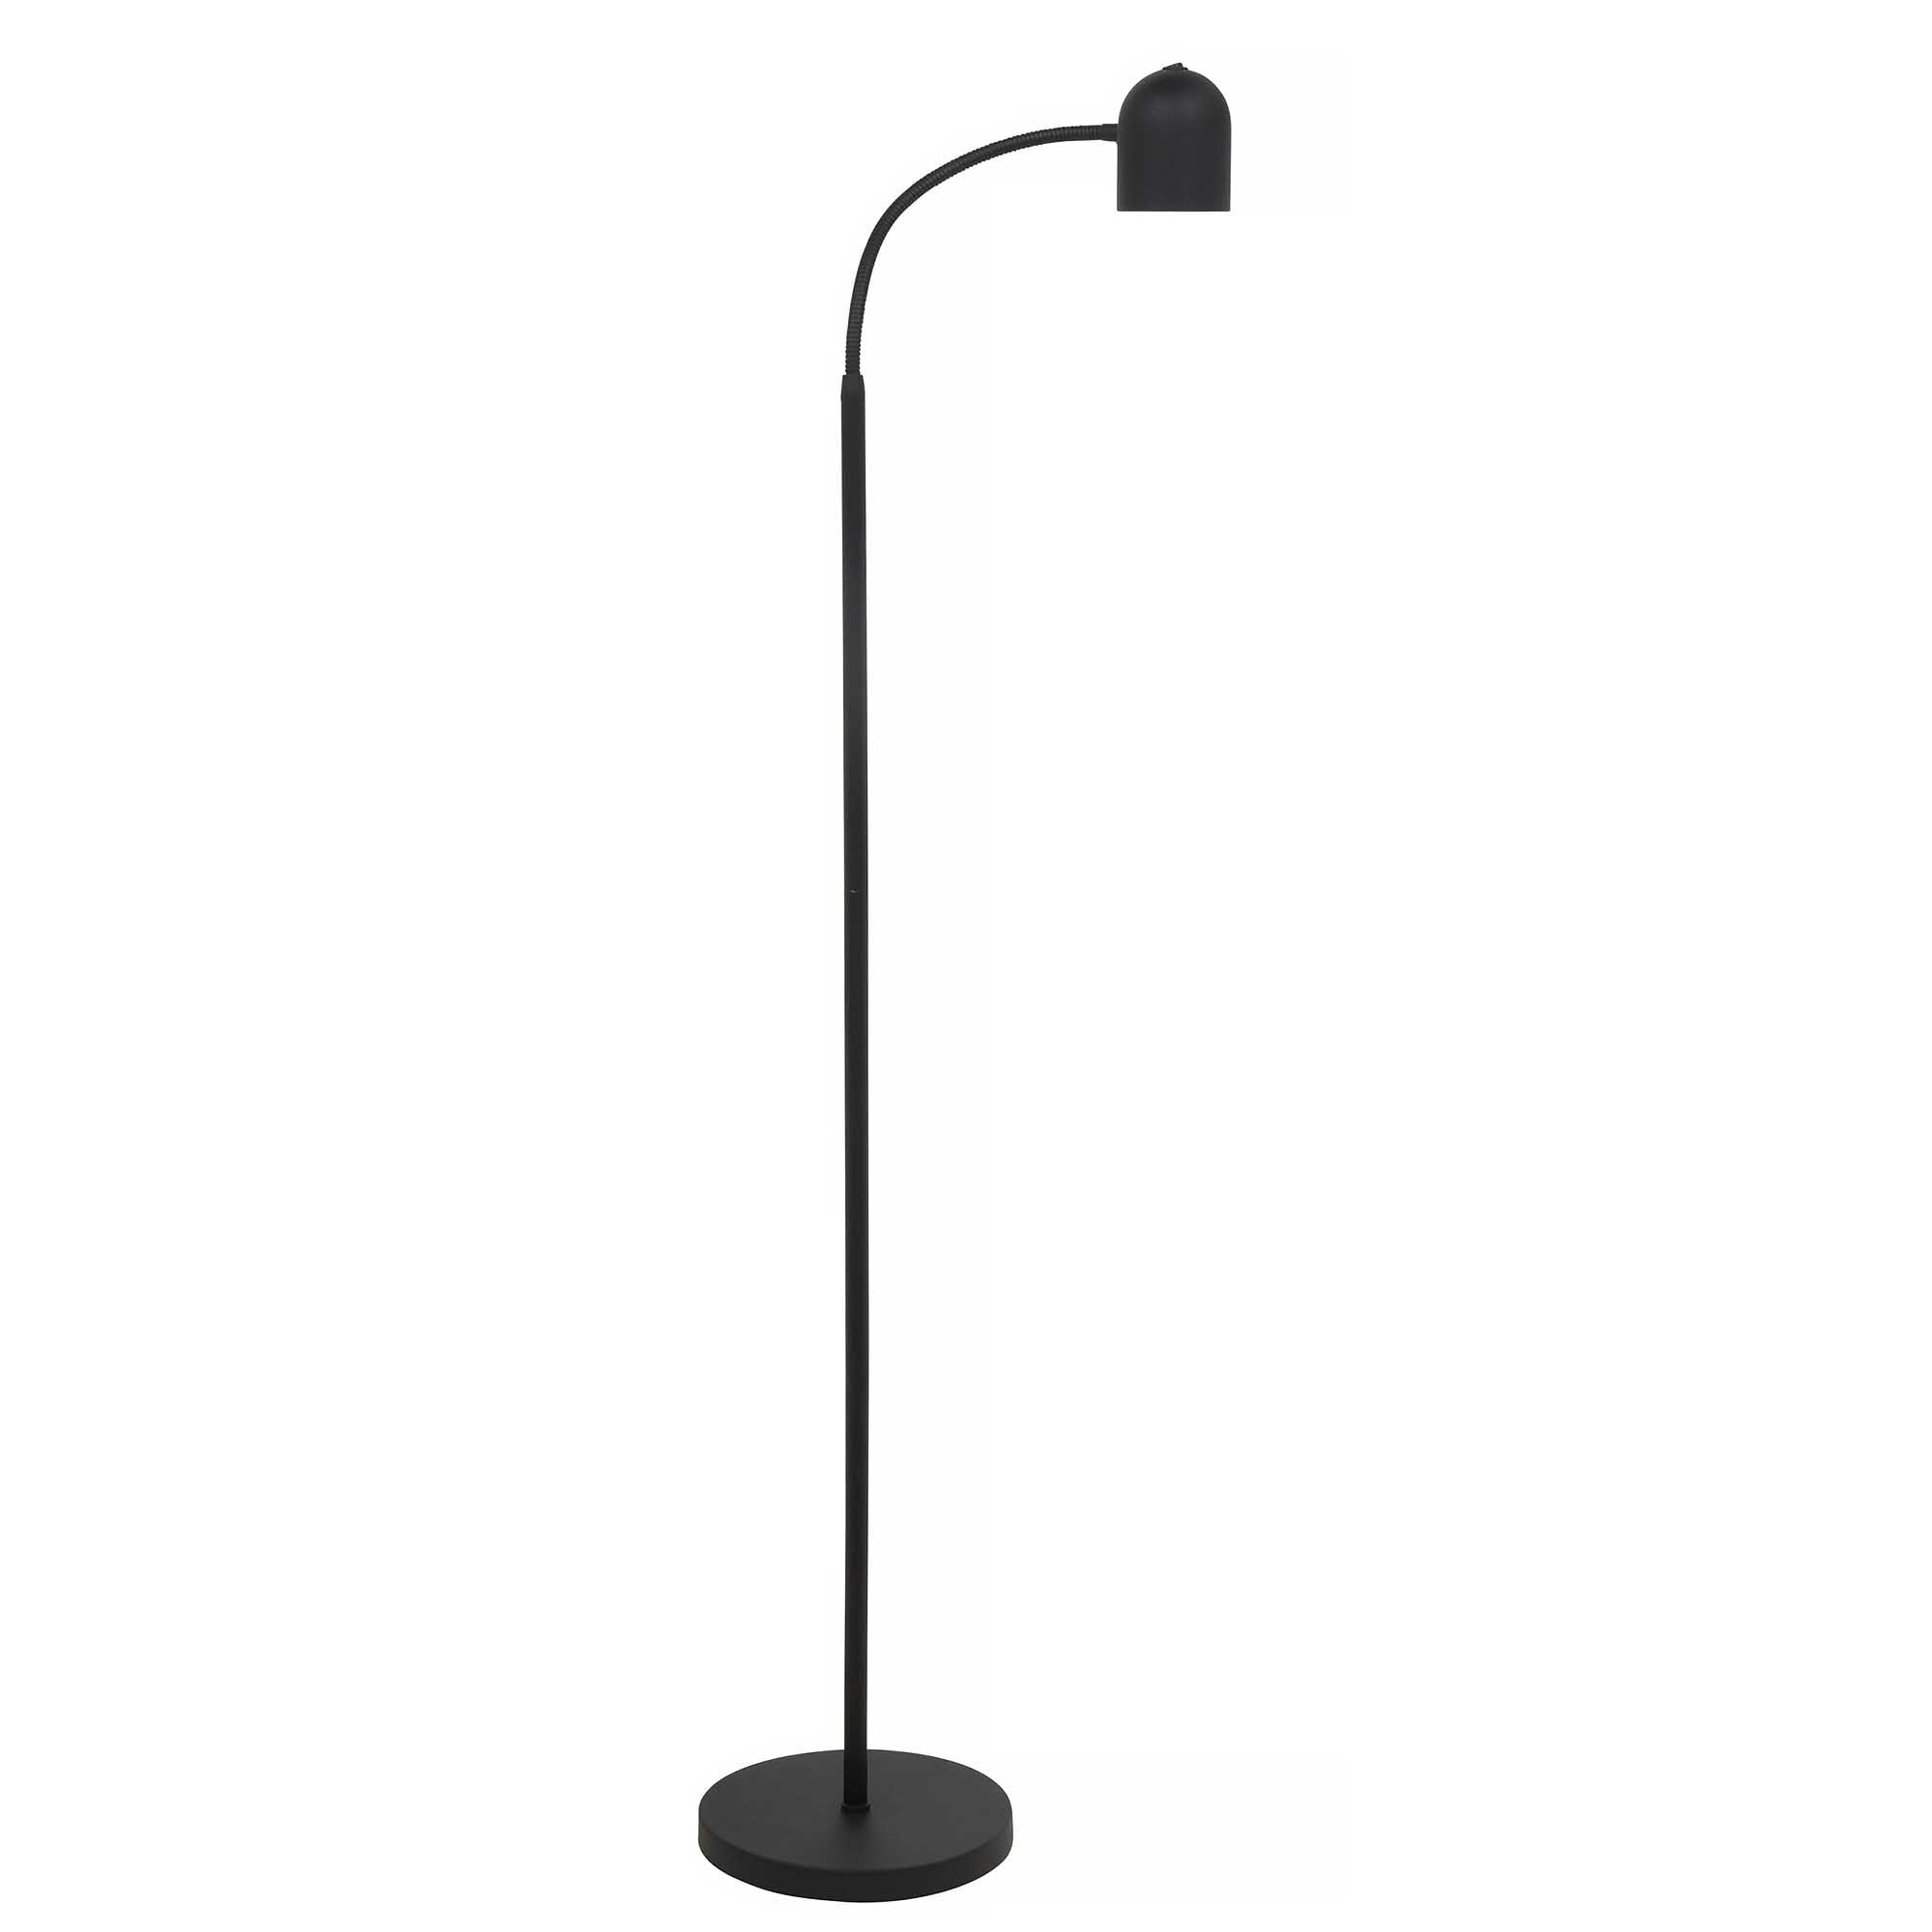 Highlight Vloerlamp Umbria flex H 120 cm zwart